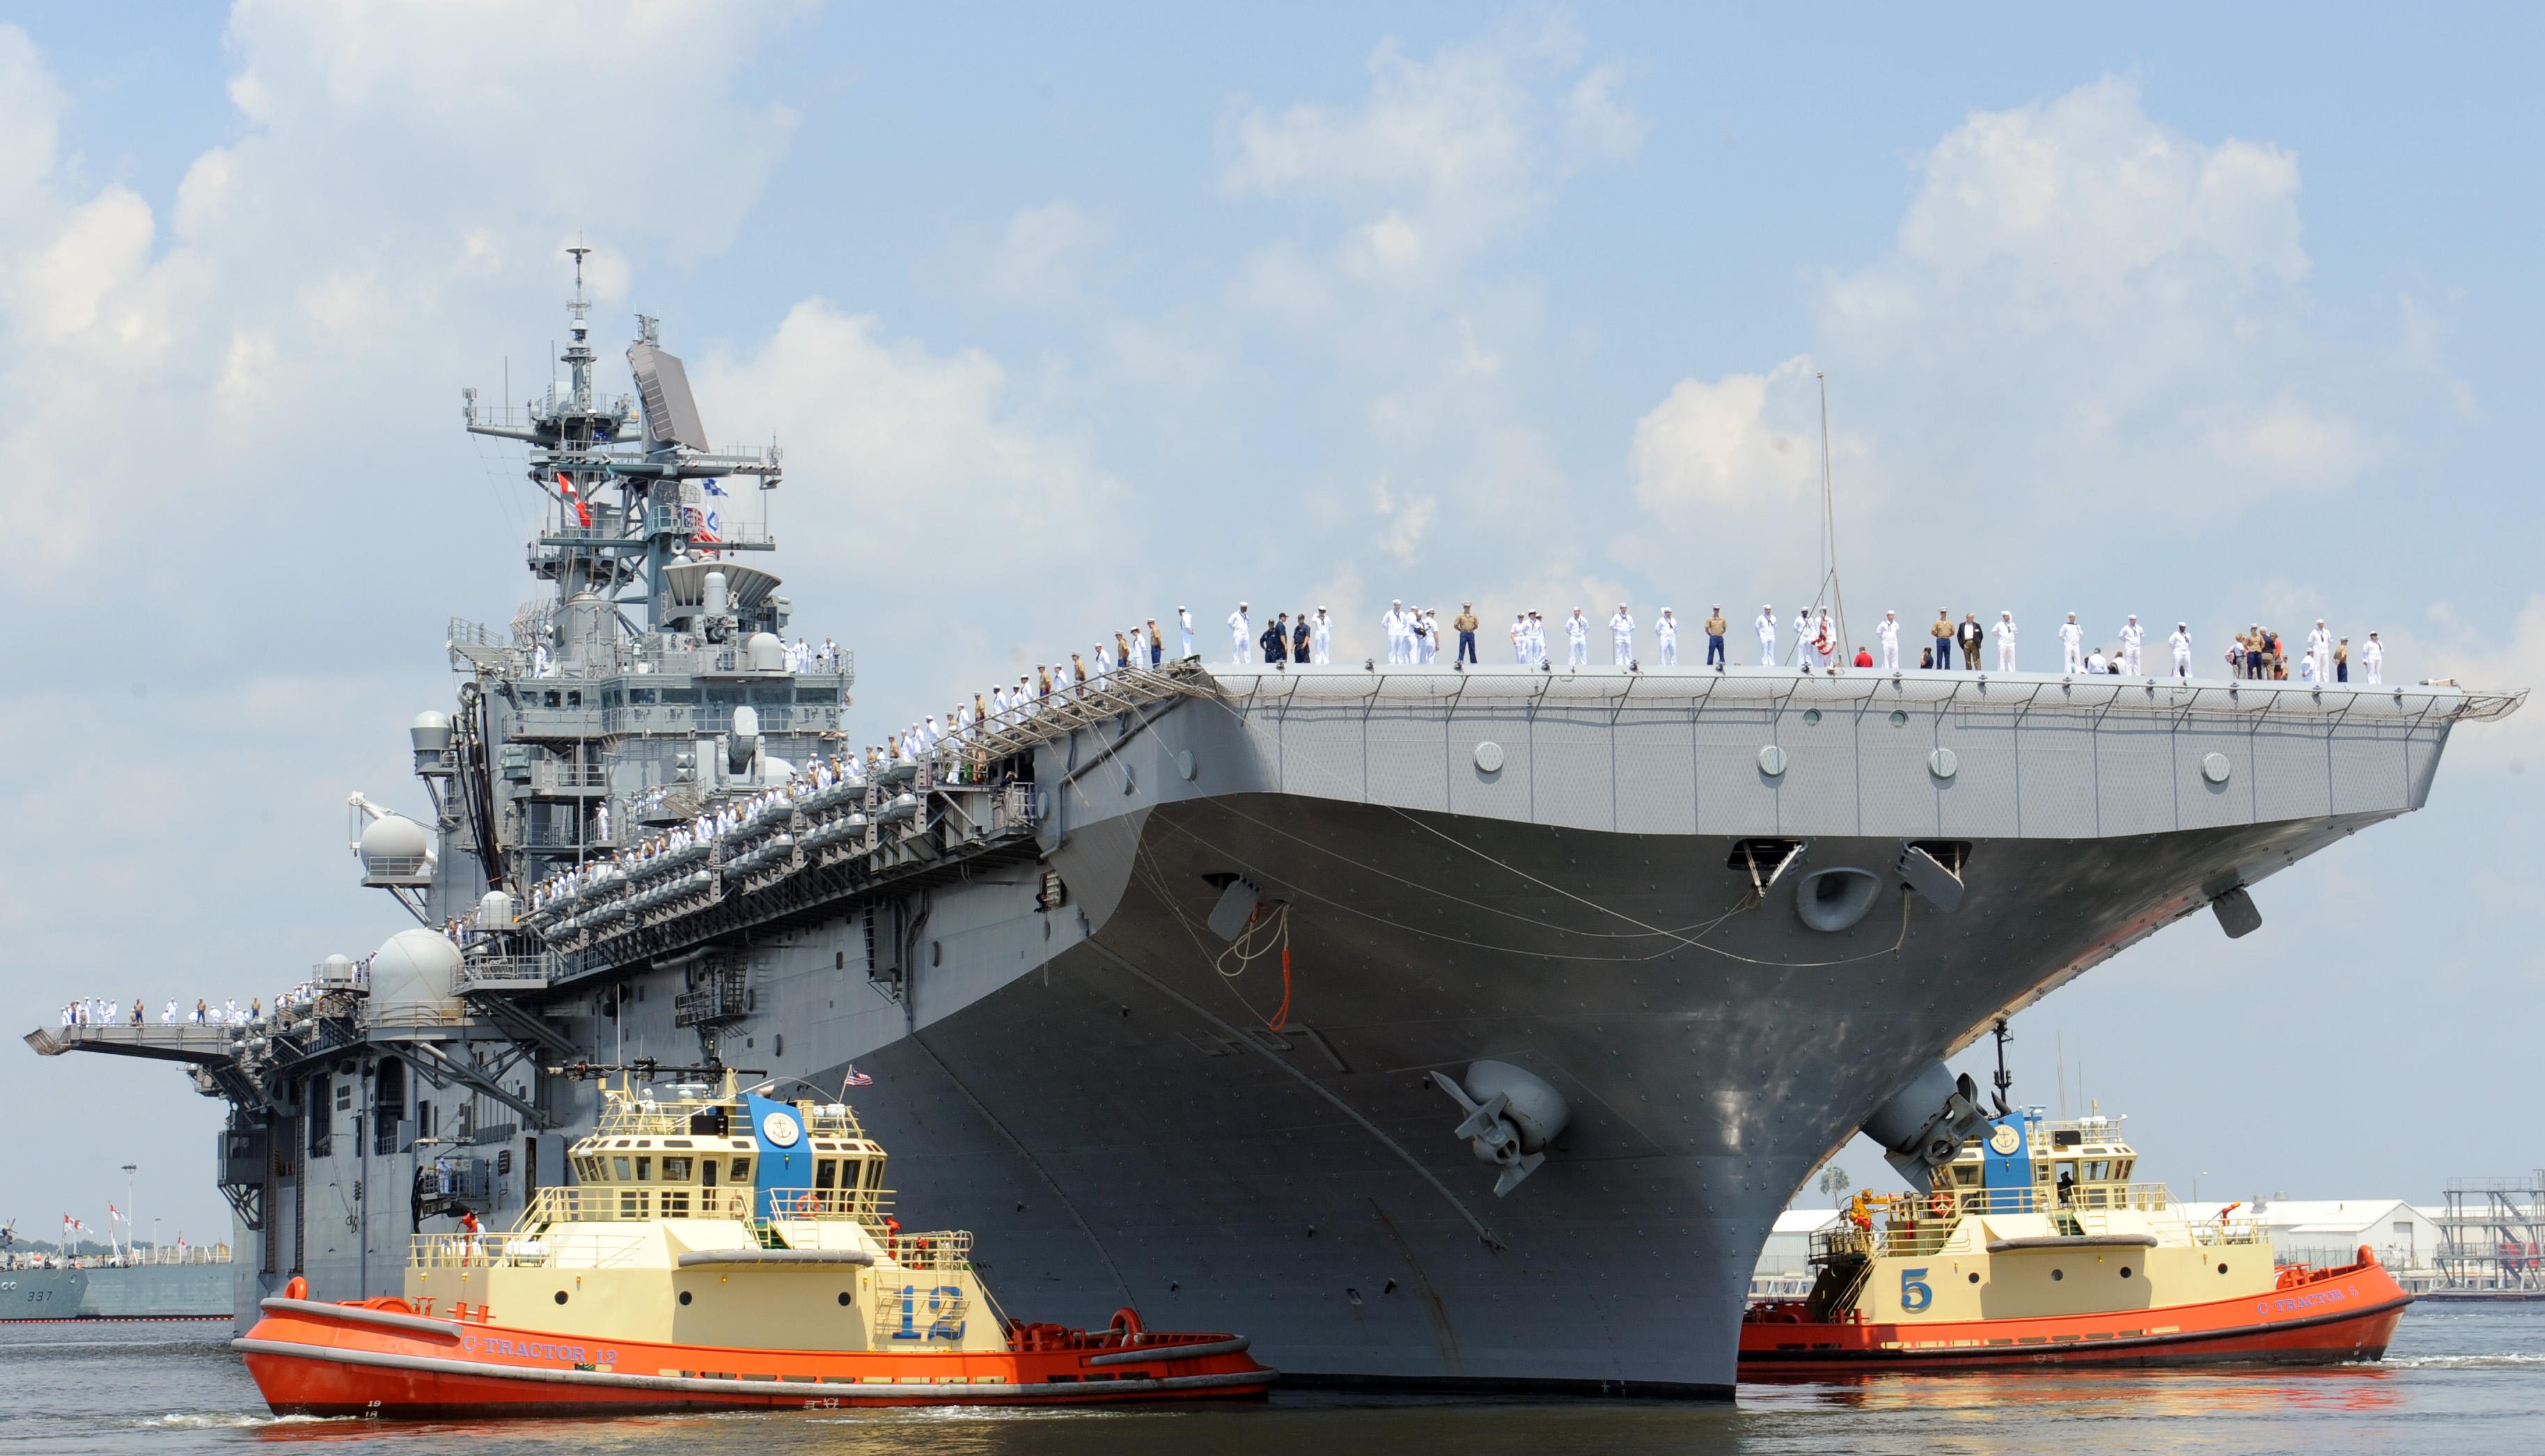 USS IWO JIMA LHD-7 Einlaufen Mayport am 17.08.2014 Bild: U.S. Navy